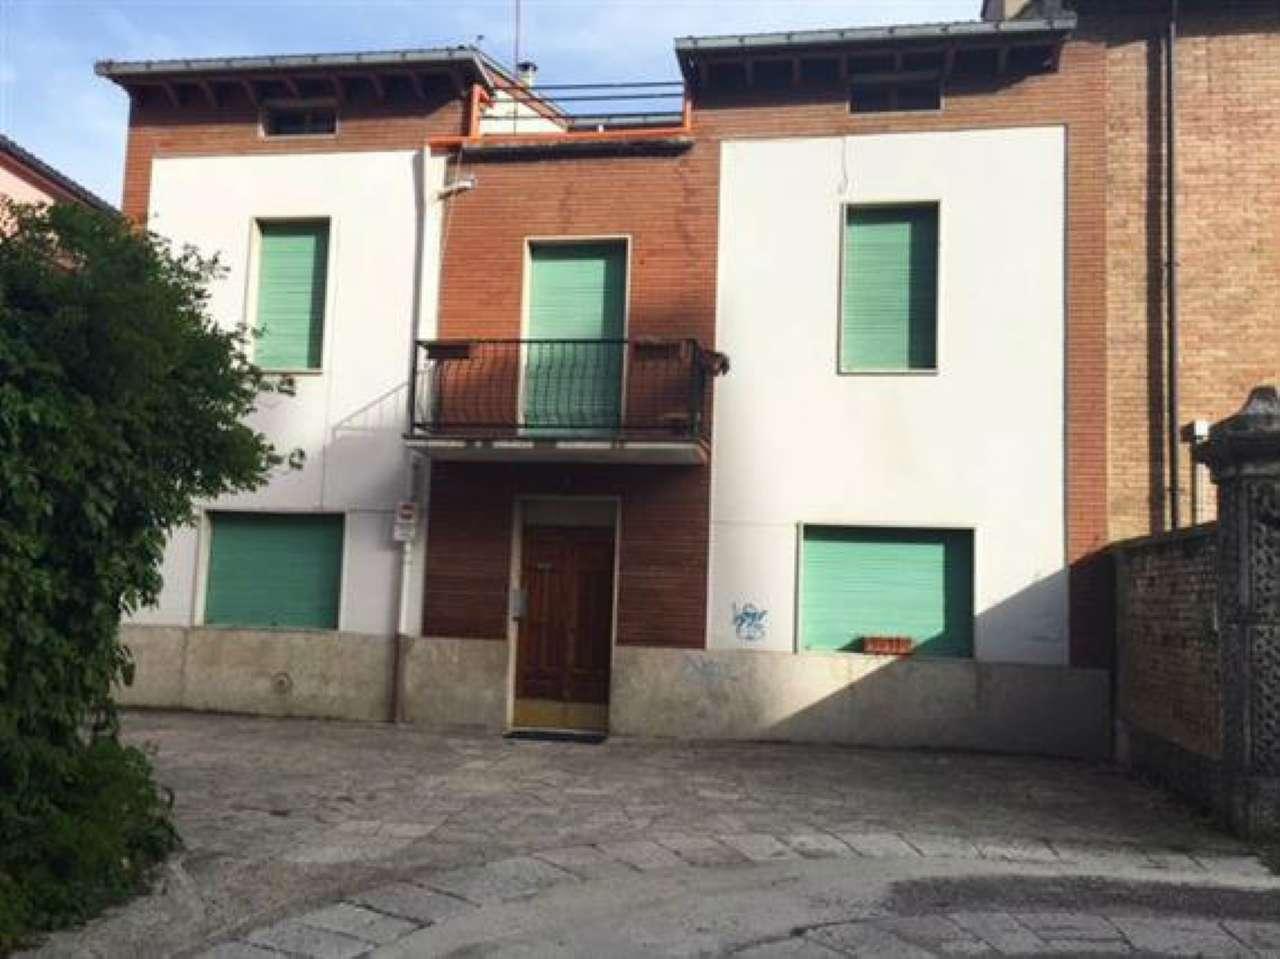 Stabile in vendita a Campobasso (CB)